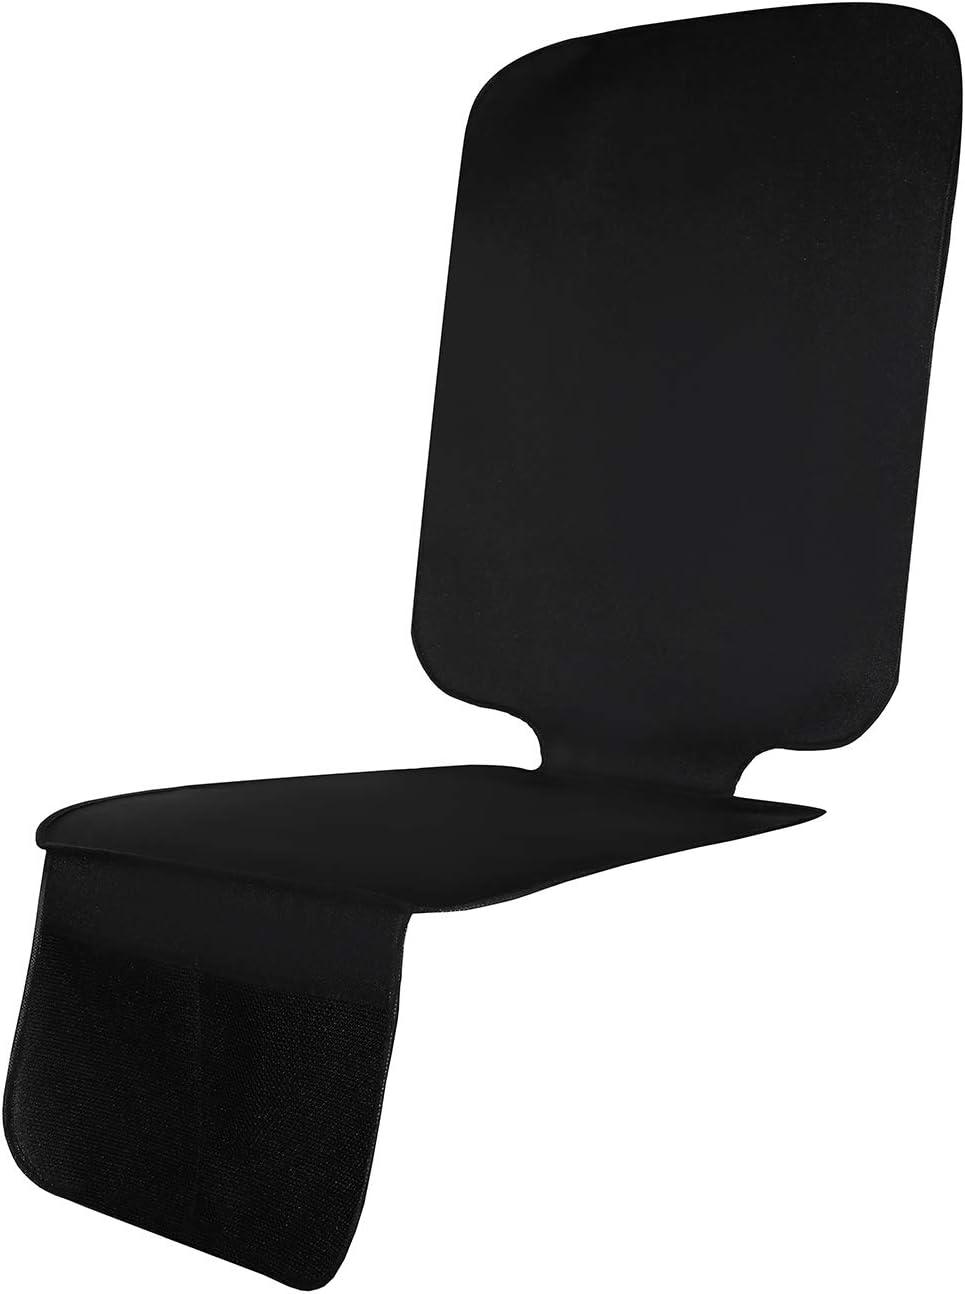 Kindersitzunterlage Autositzauflage Sitzschoner Isofix Geeignet Universell 6299 Auto